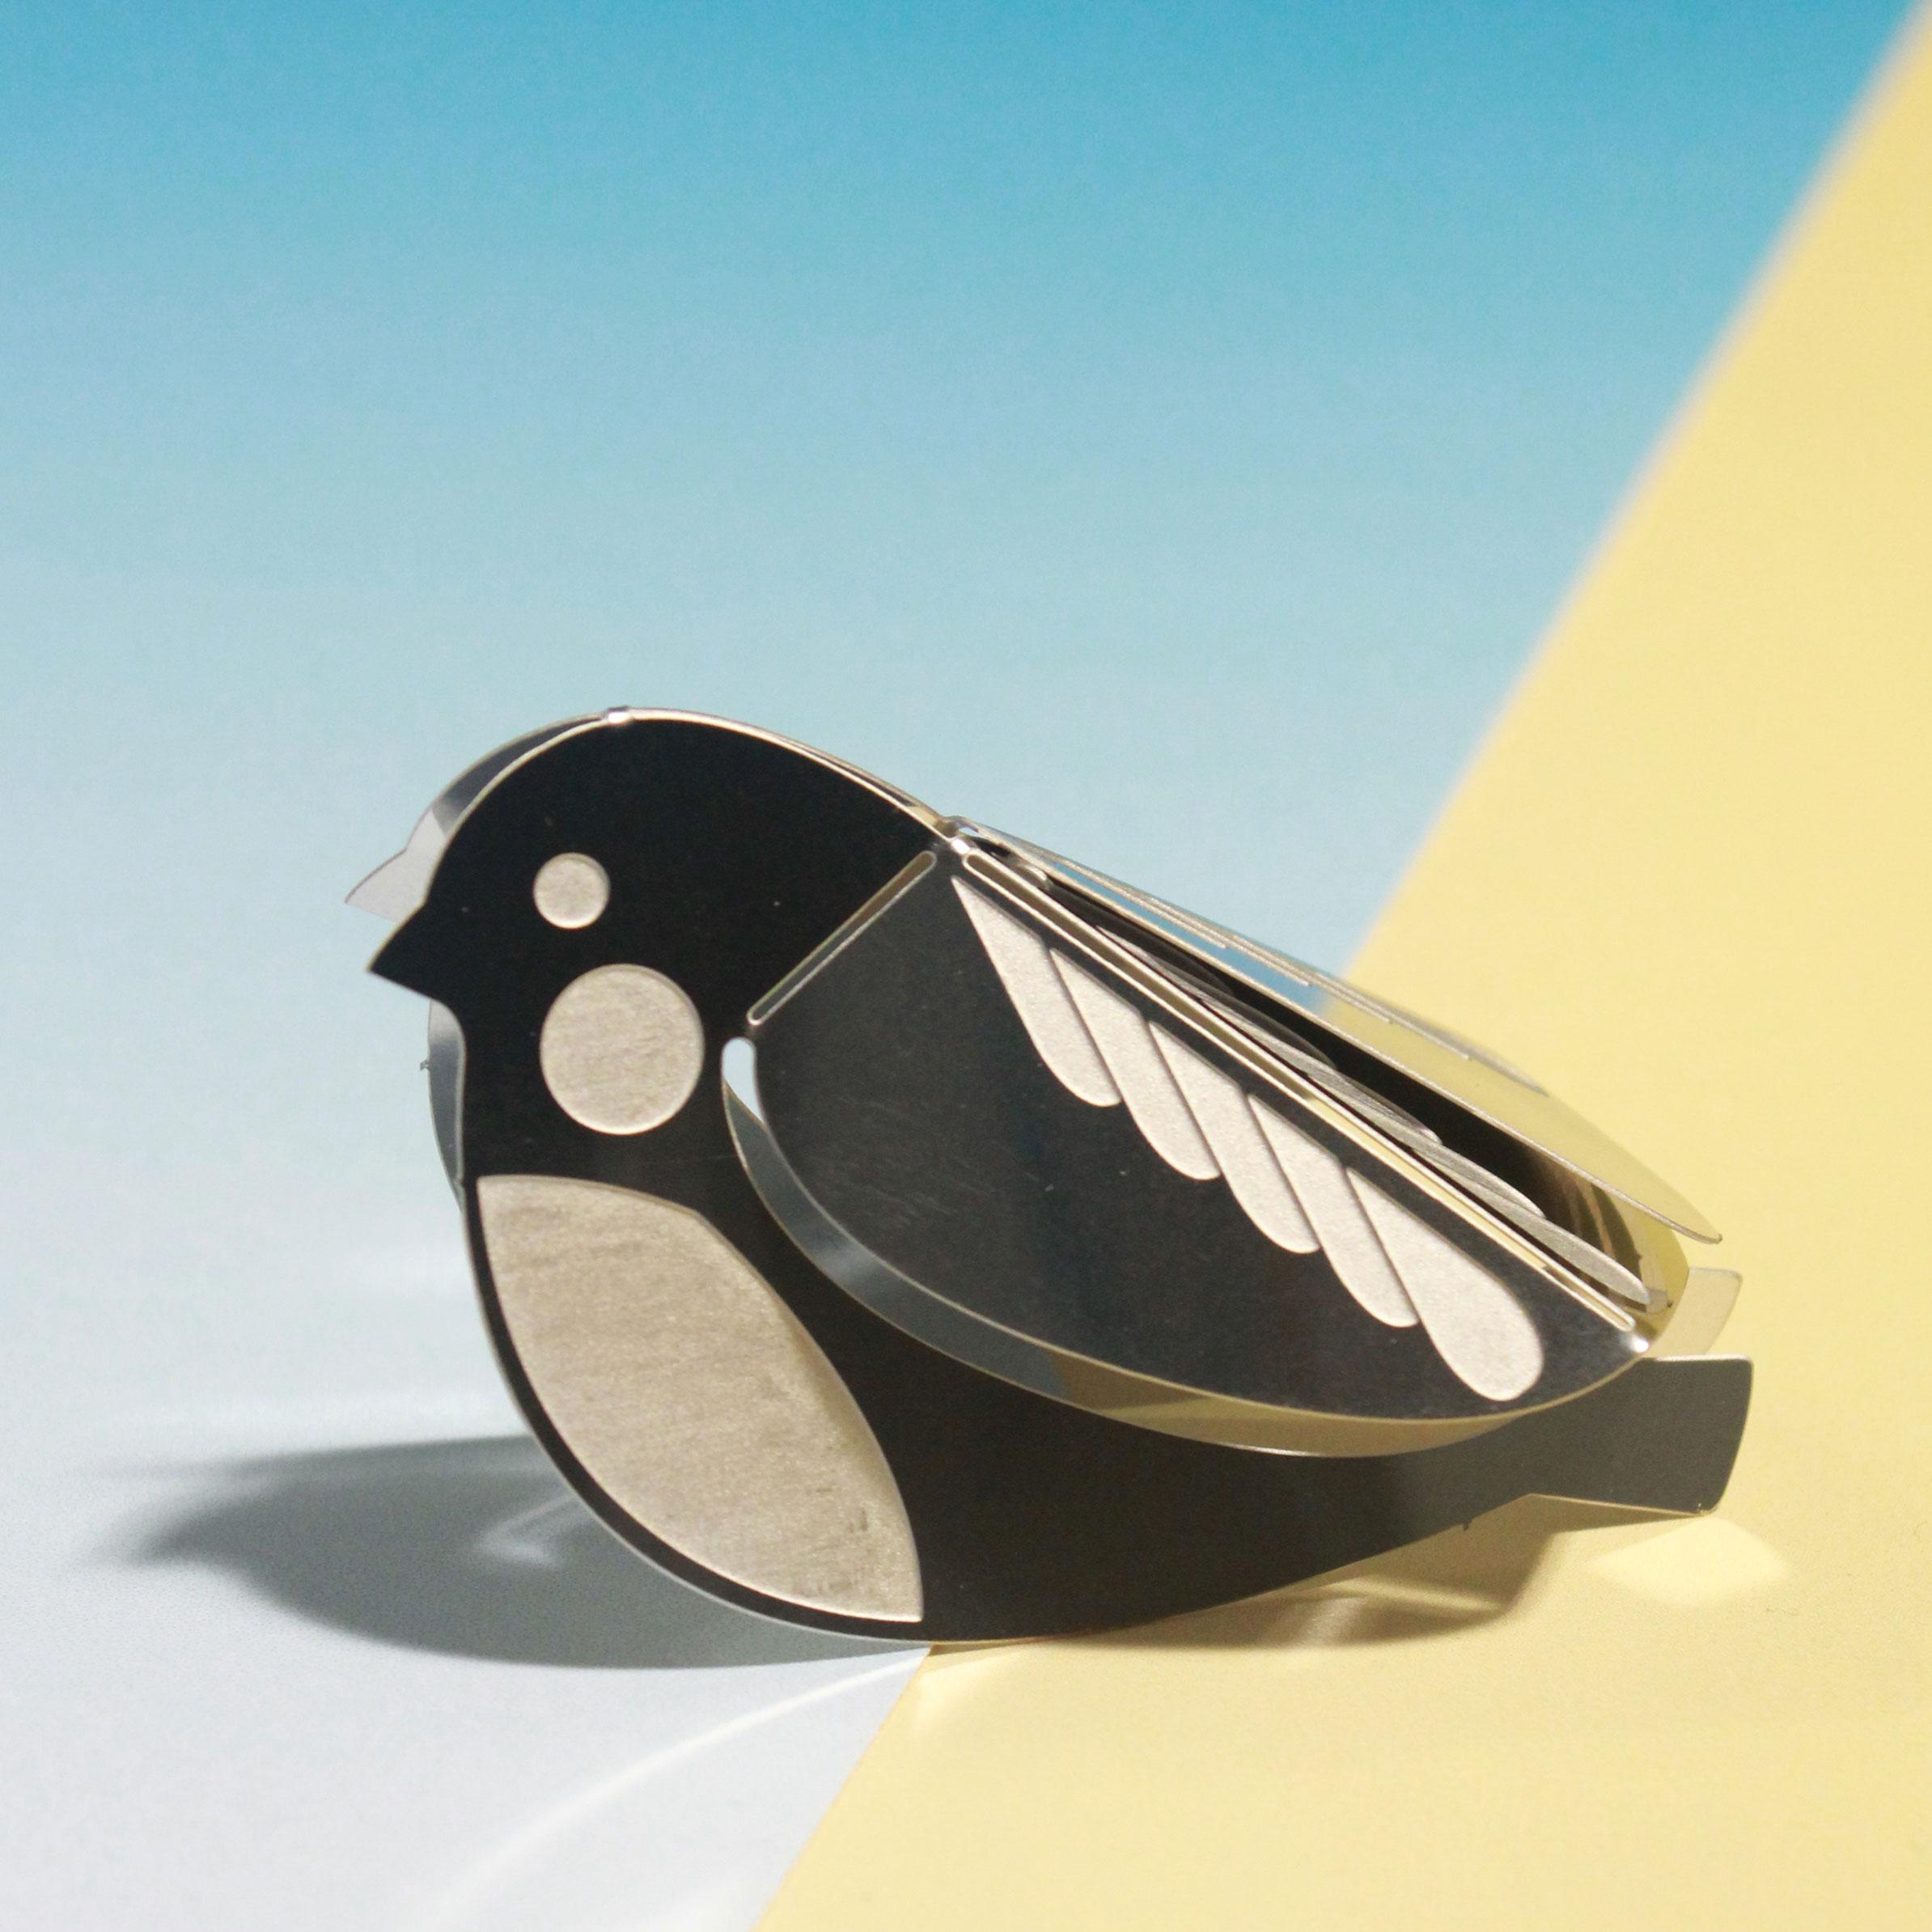 foldingBird